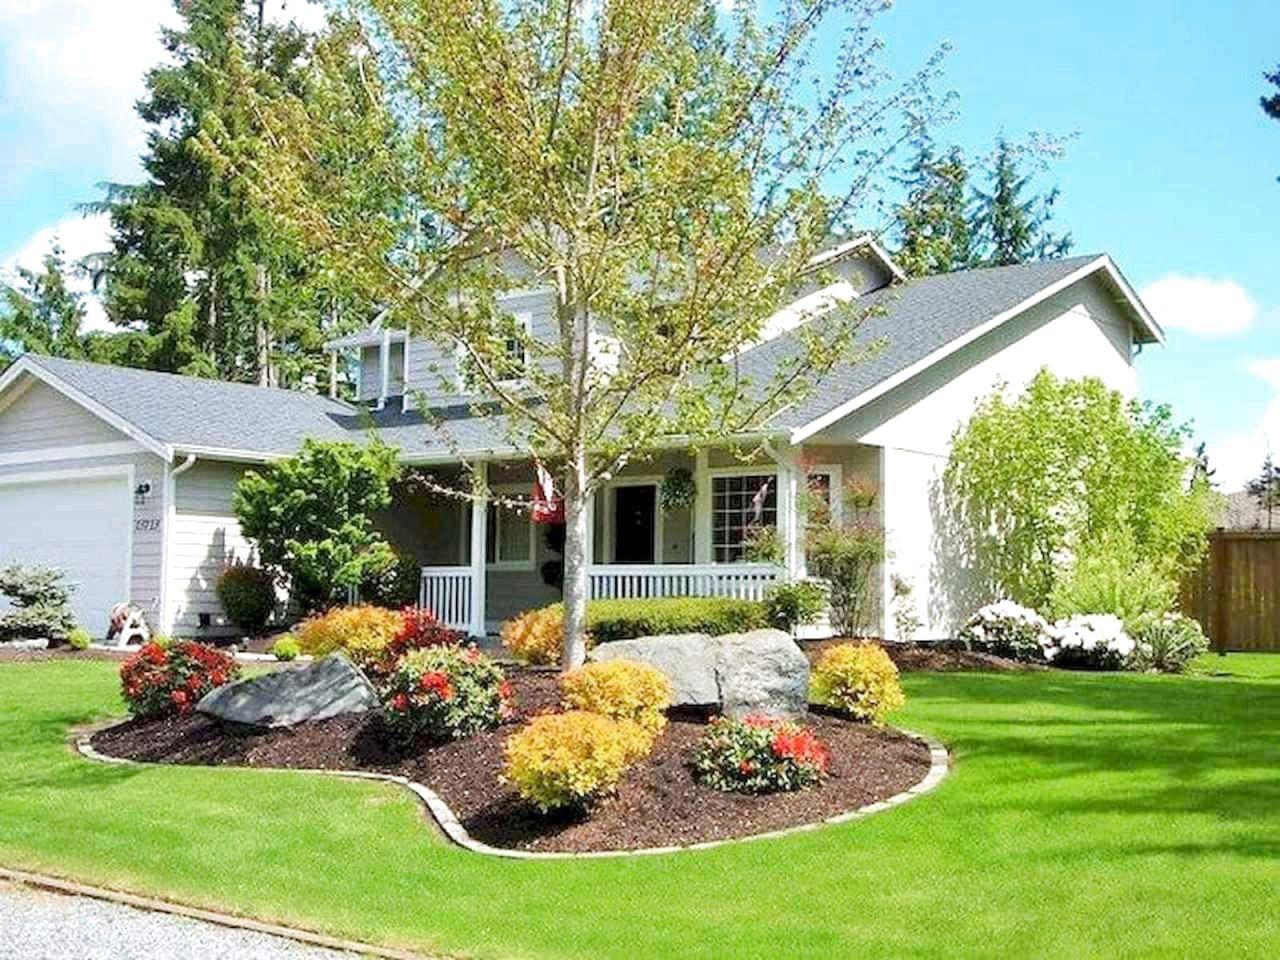 43 Best Front Yard Garden Landscaping Design Ideas And ...